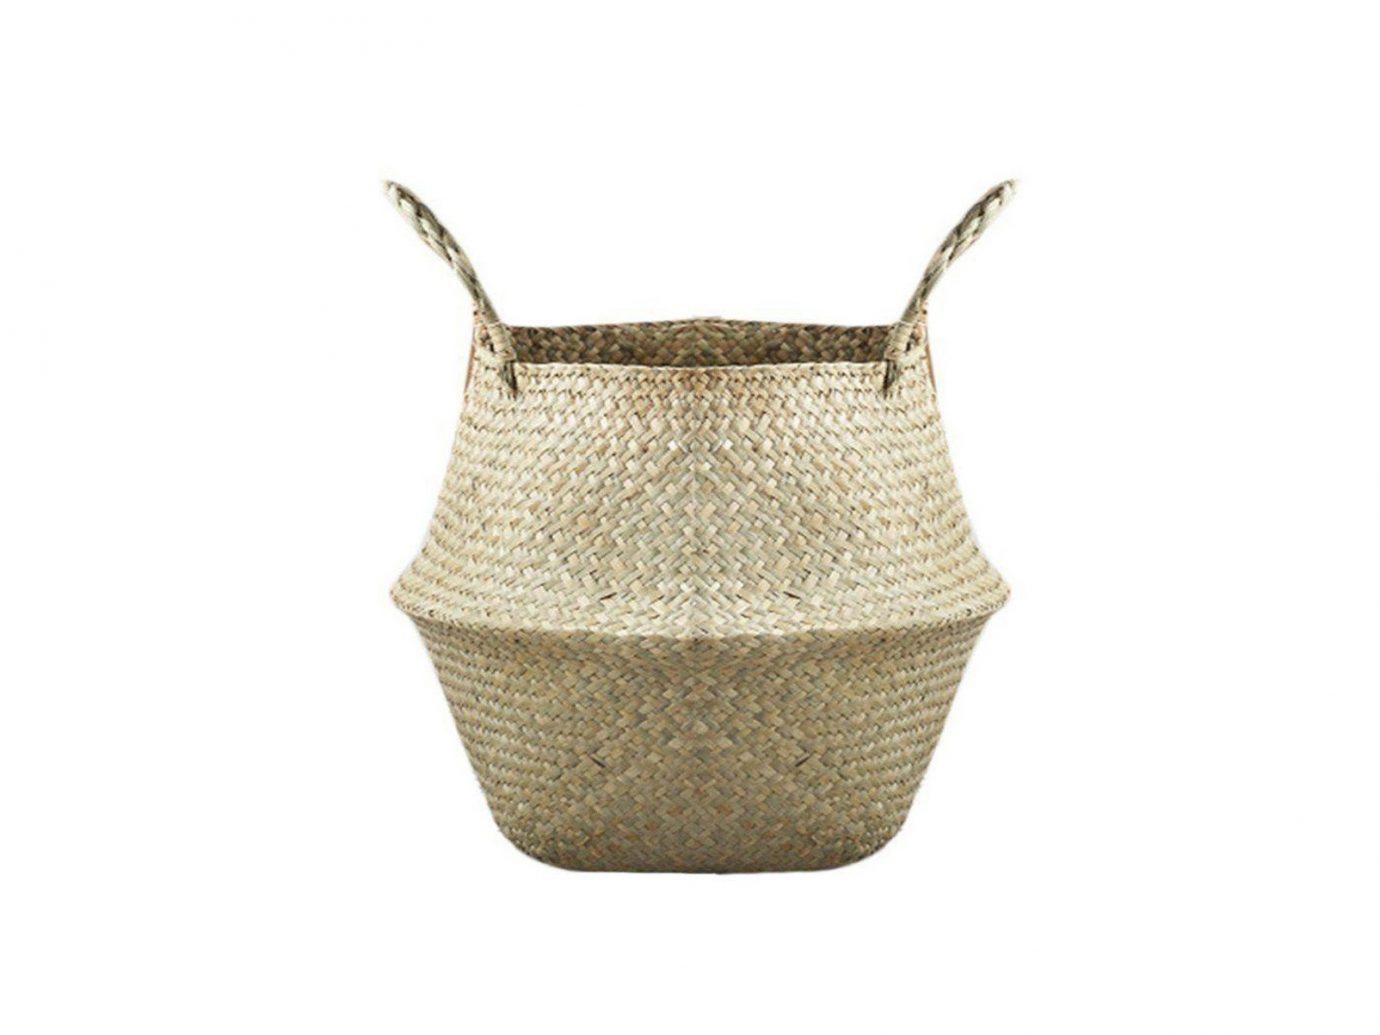 Travel Shop kitchenware product design basket product